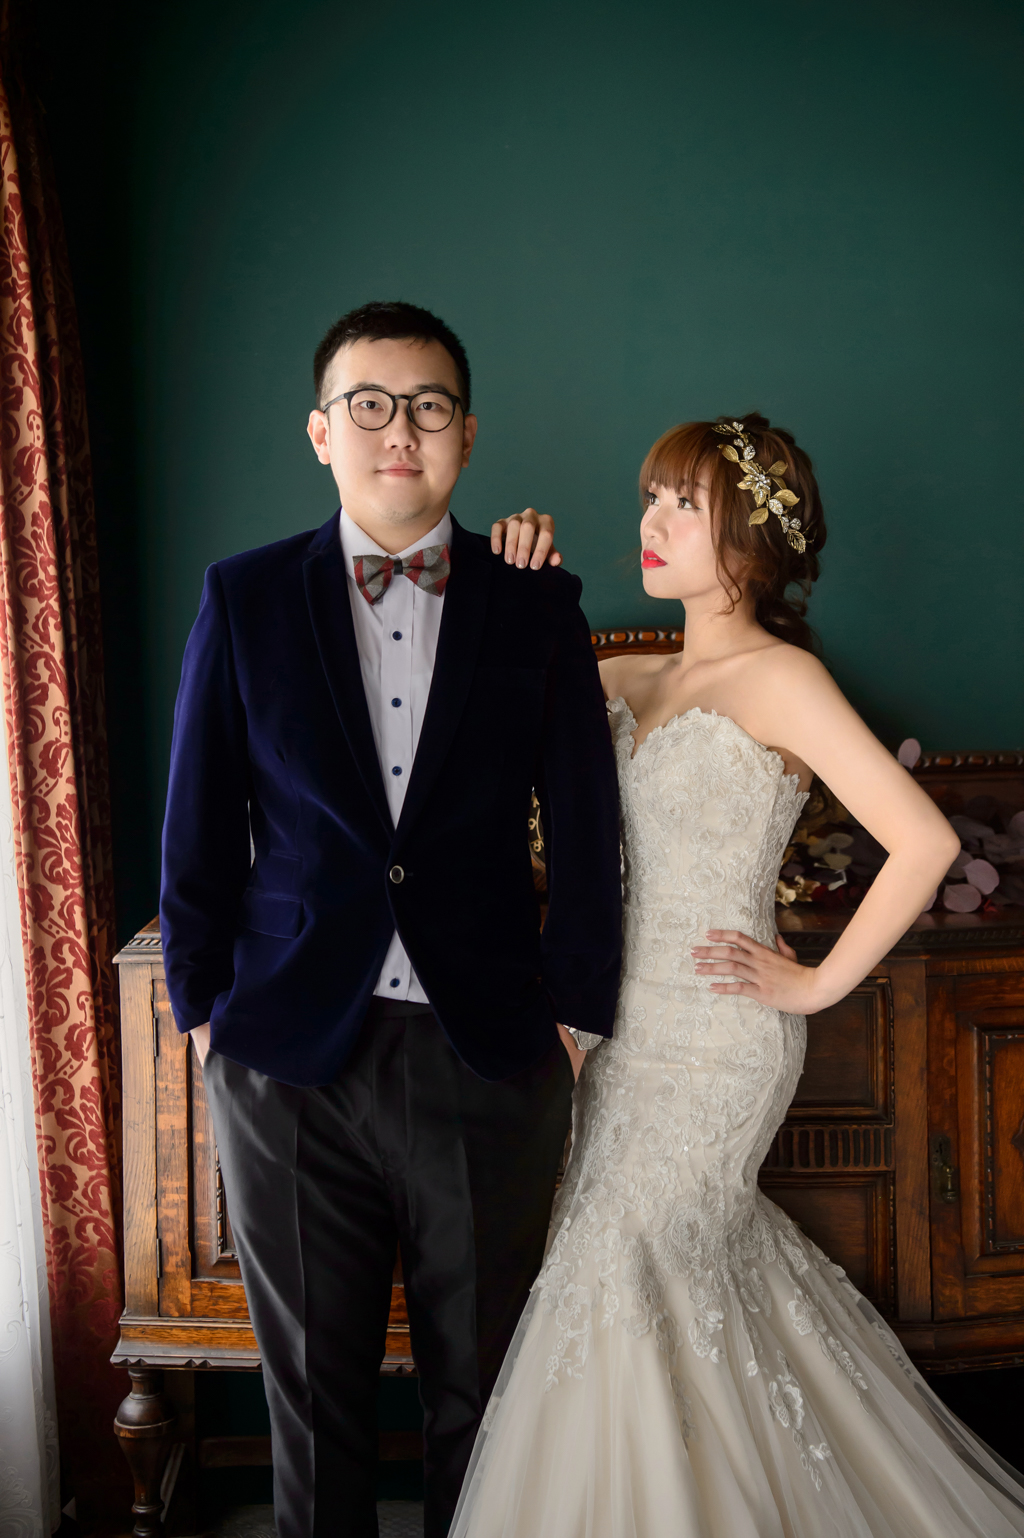 婚攝小勇, 小寶團隊, 自助婚紗, niniko, wedding day-009